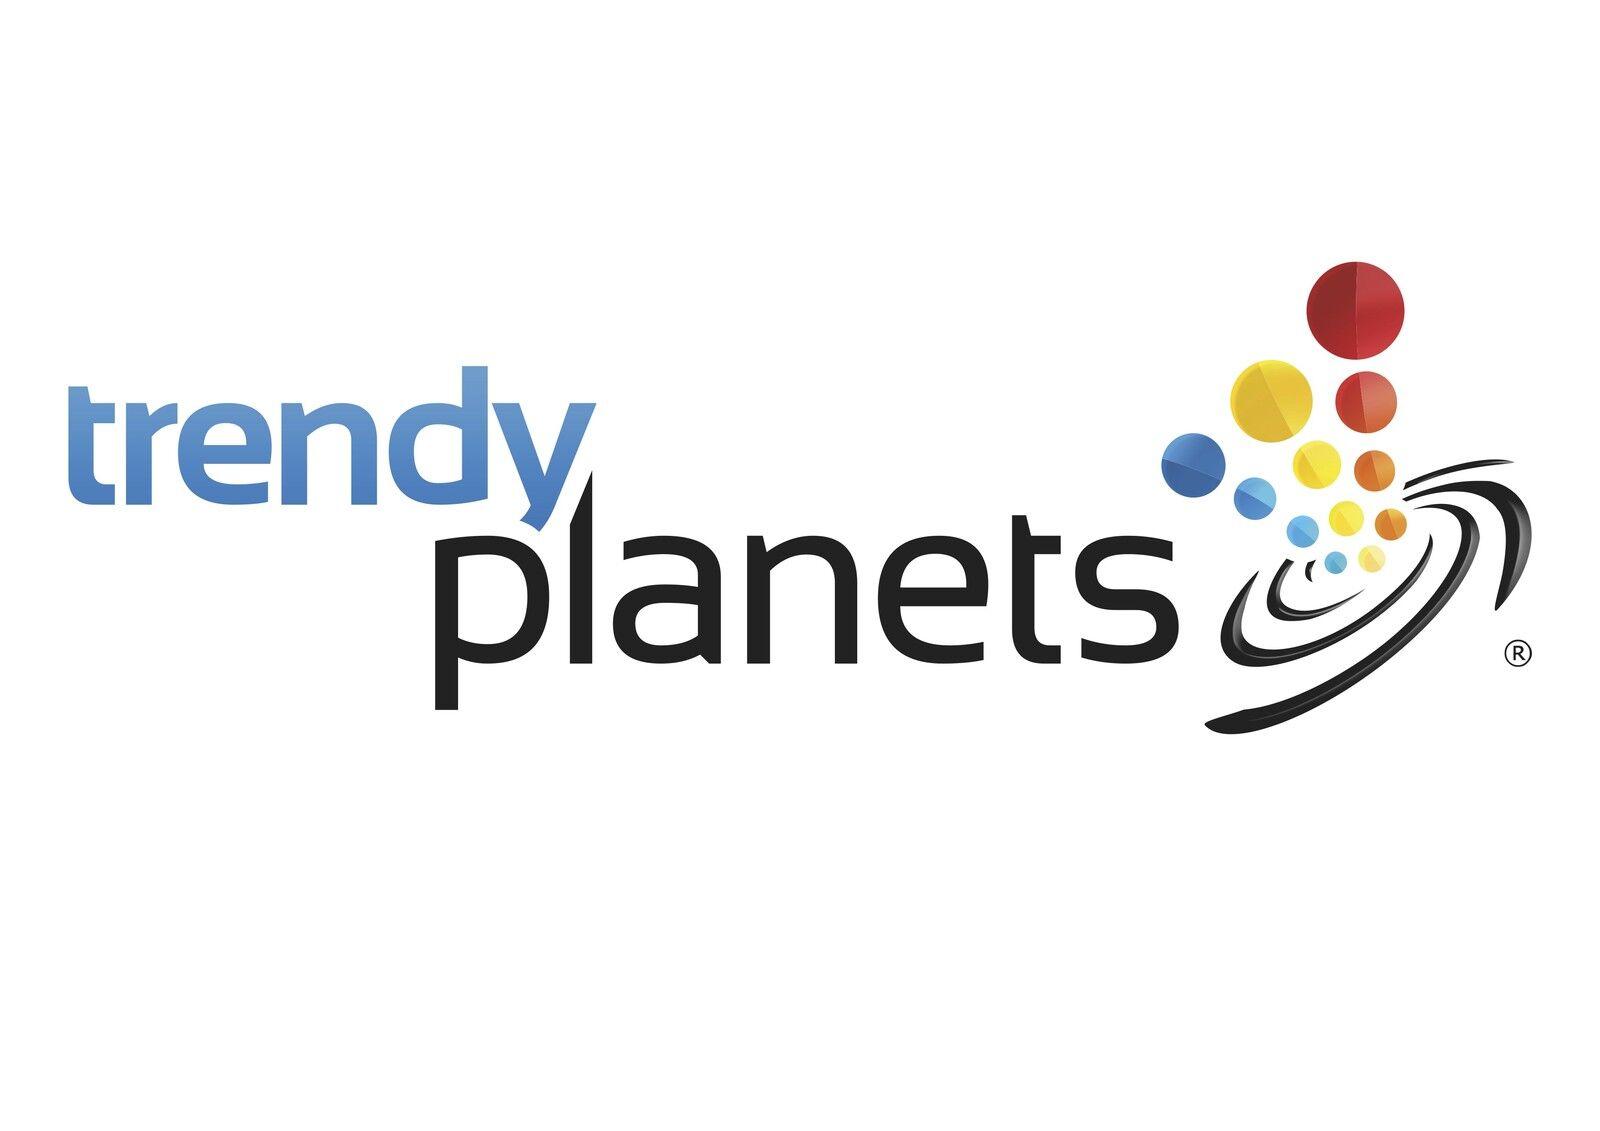 trendy planets